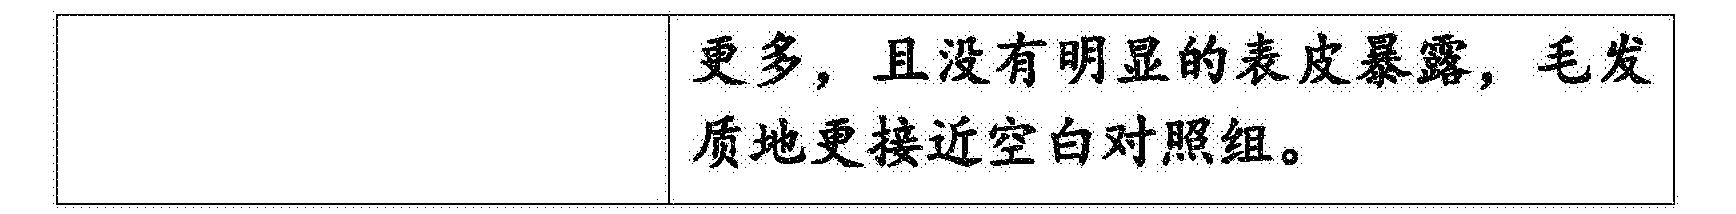 Figure CN107281185AD00081